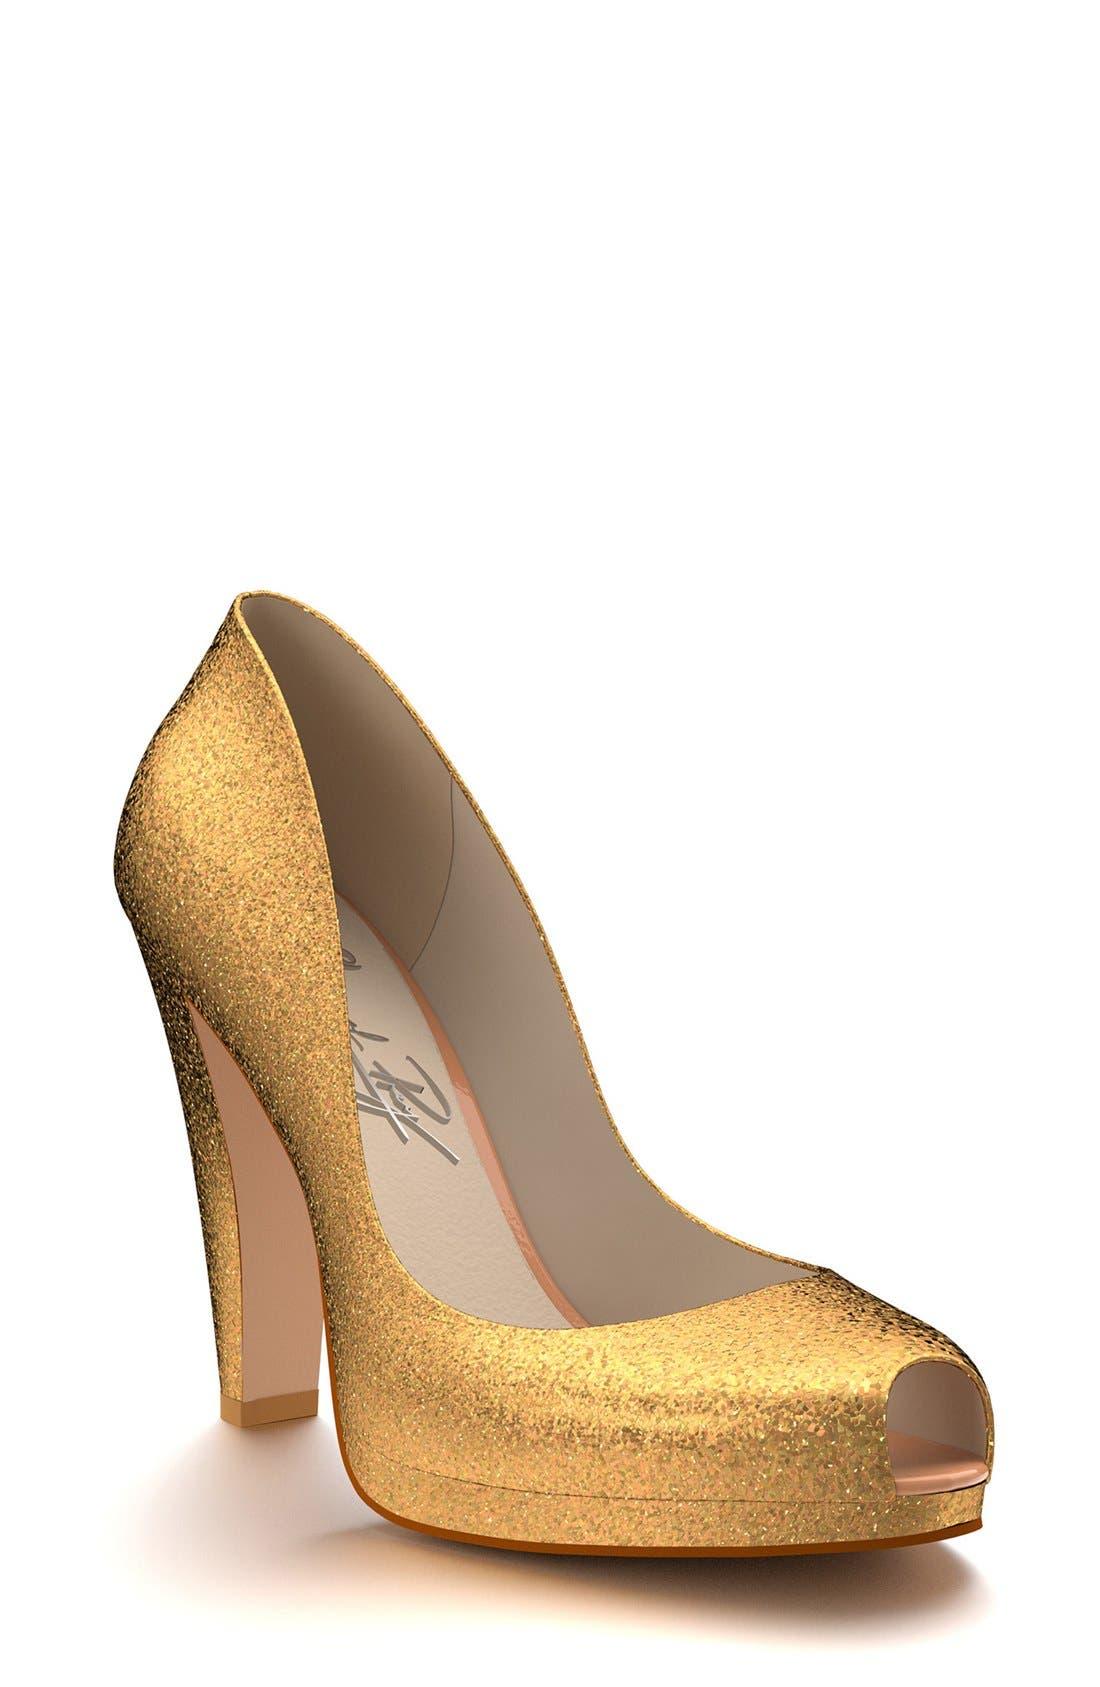 Main Image - Shoes of Prey Glitter Platform Pump (Women)